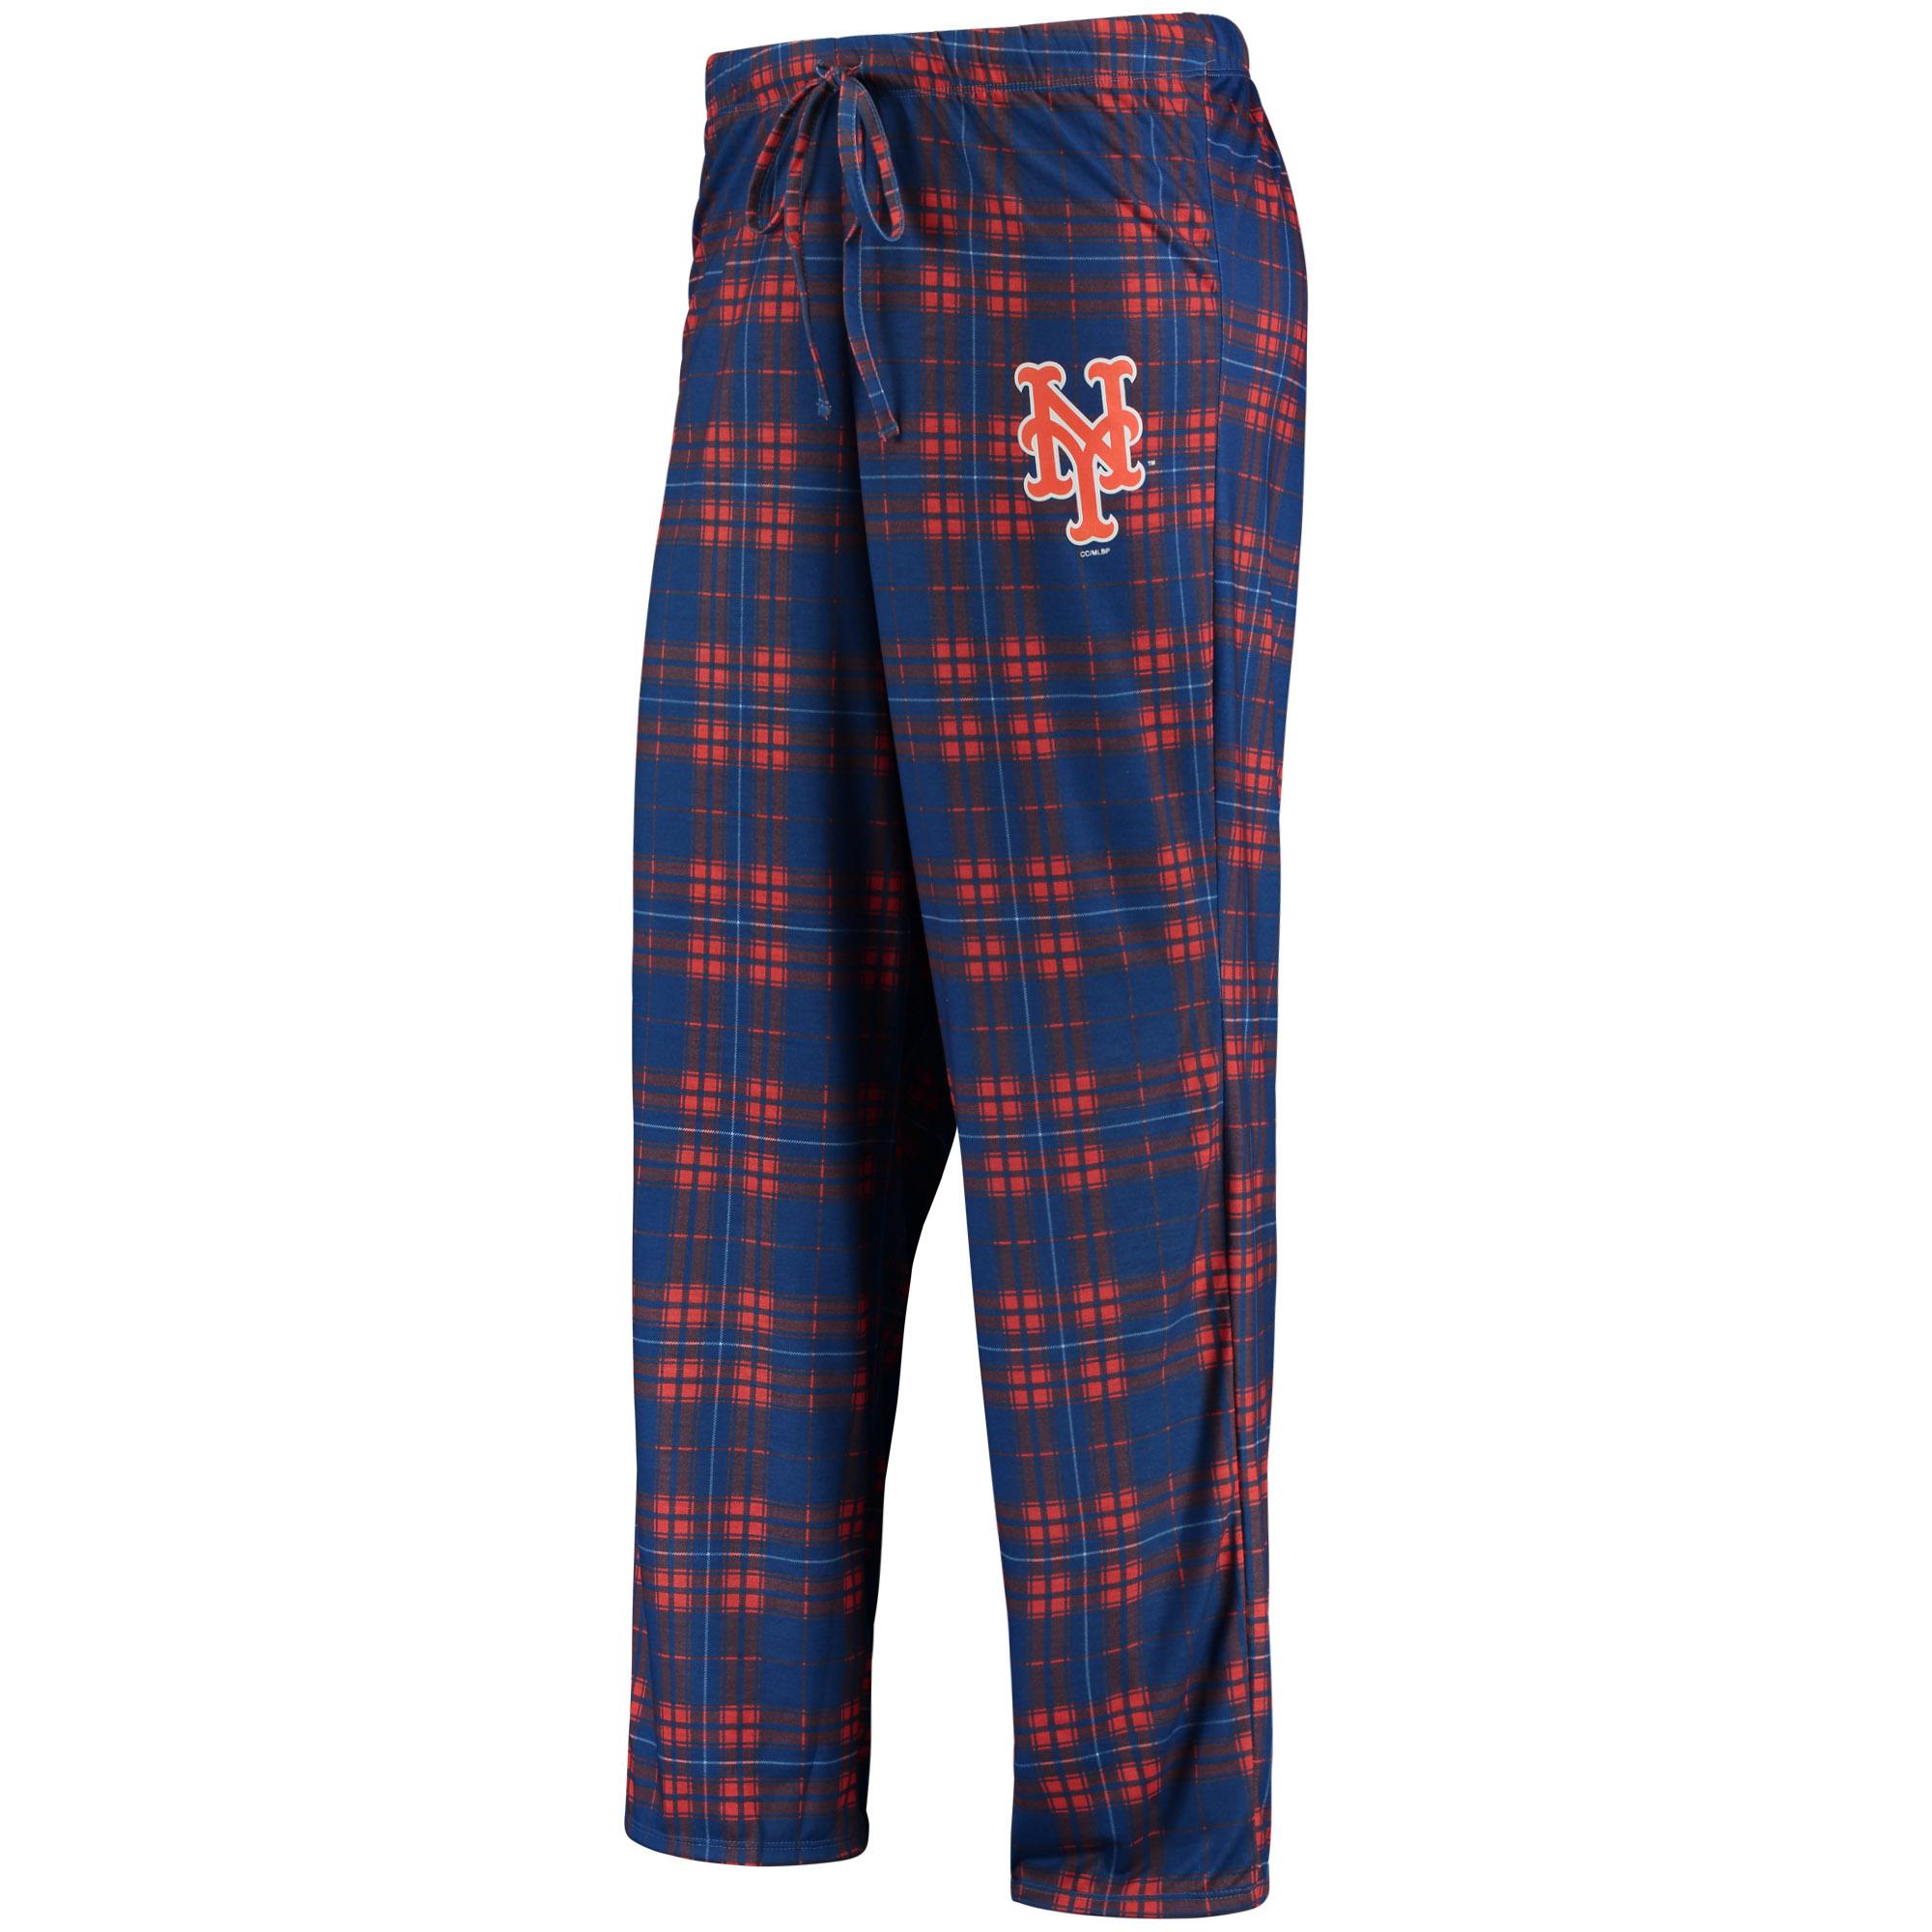 New York Mets Concepts Sport Women's Plus Size Rush Knit Pants - Royal/Orange